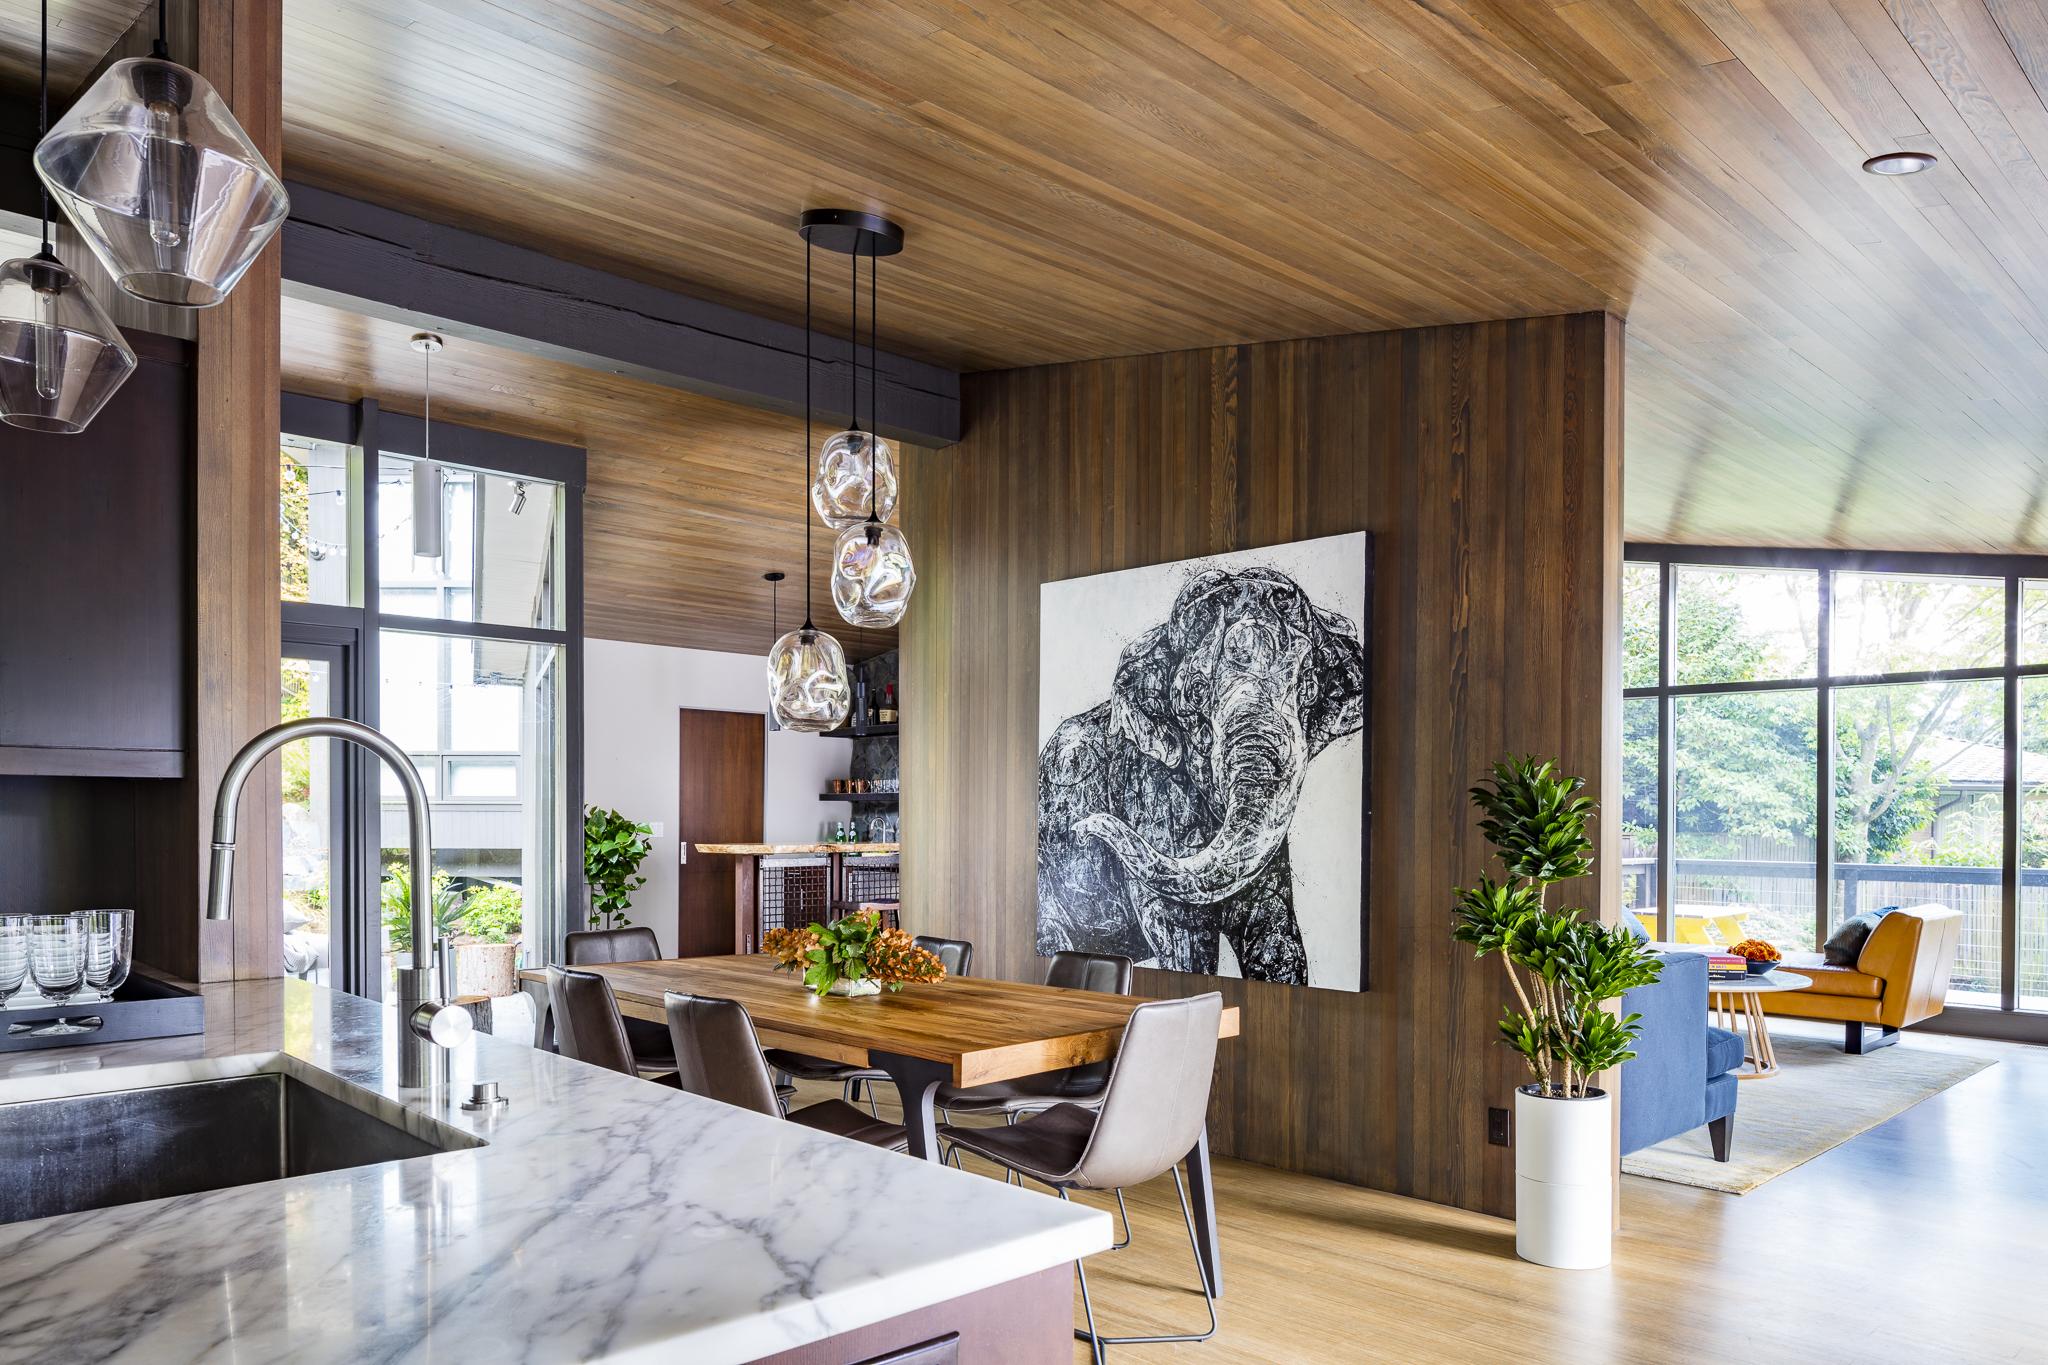 paul-moon-design-windermere-contemporary-dining-room-greatroom.jpg